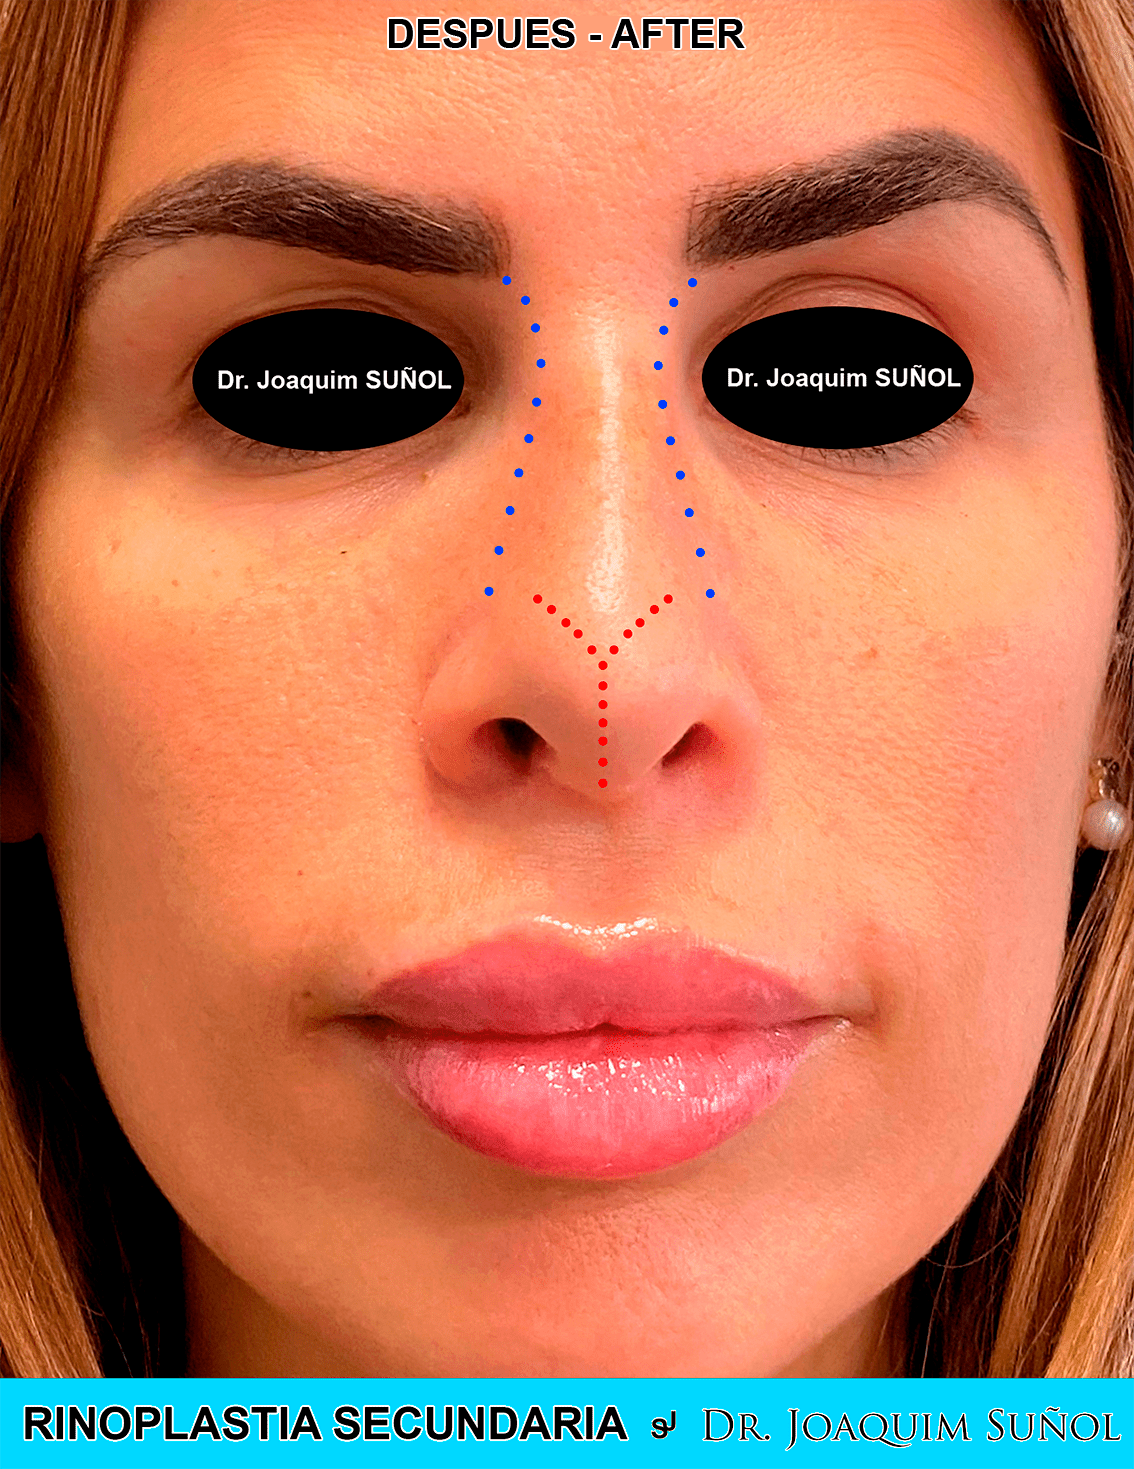 Rinoplastia Secundaria cirugia plastica estetica joaquim suñol barcelona postop